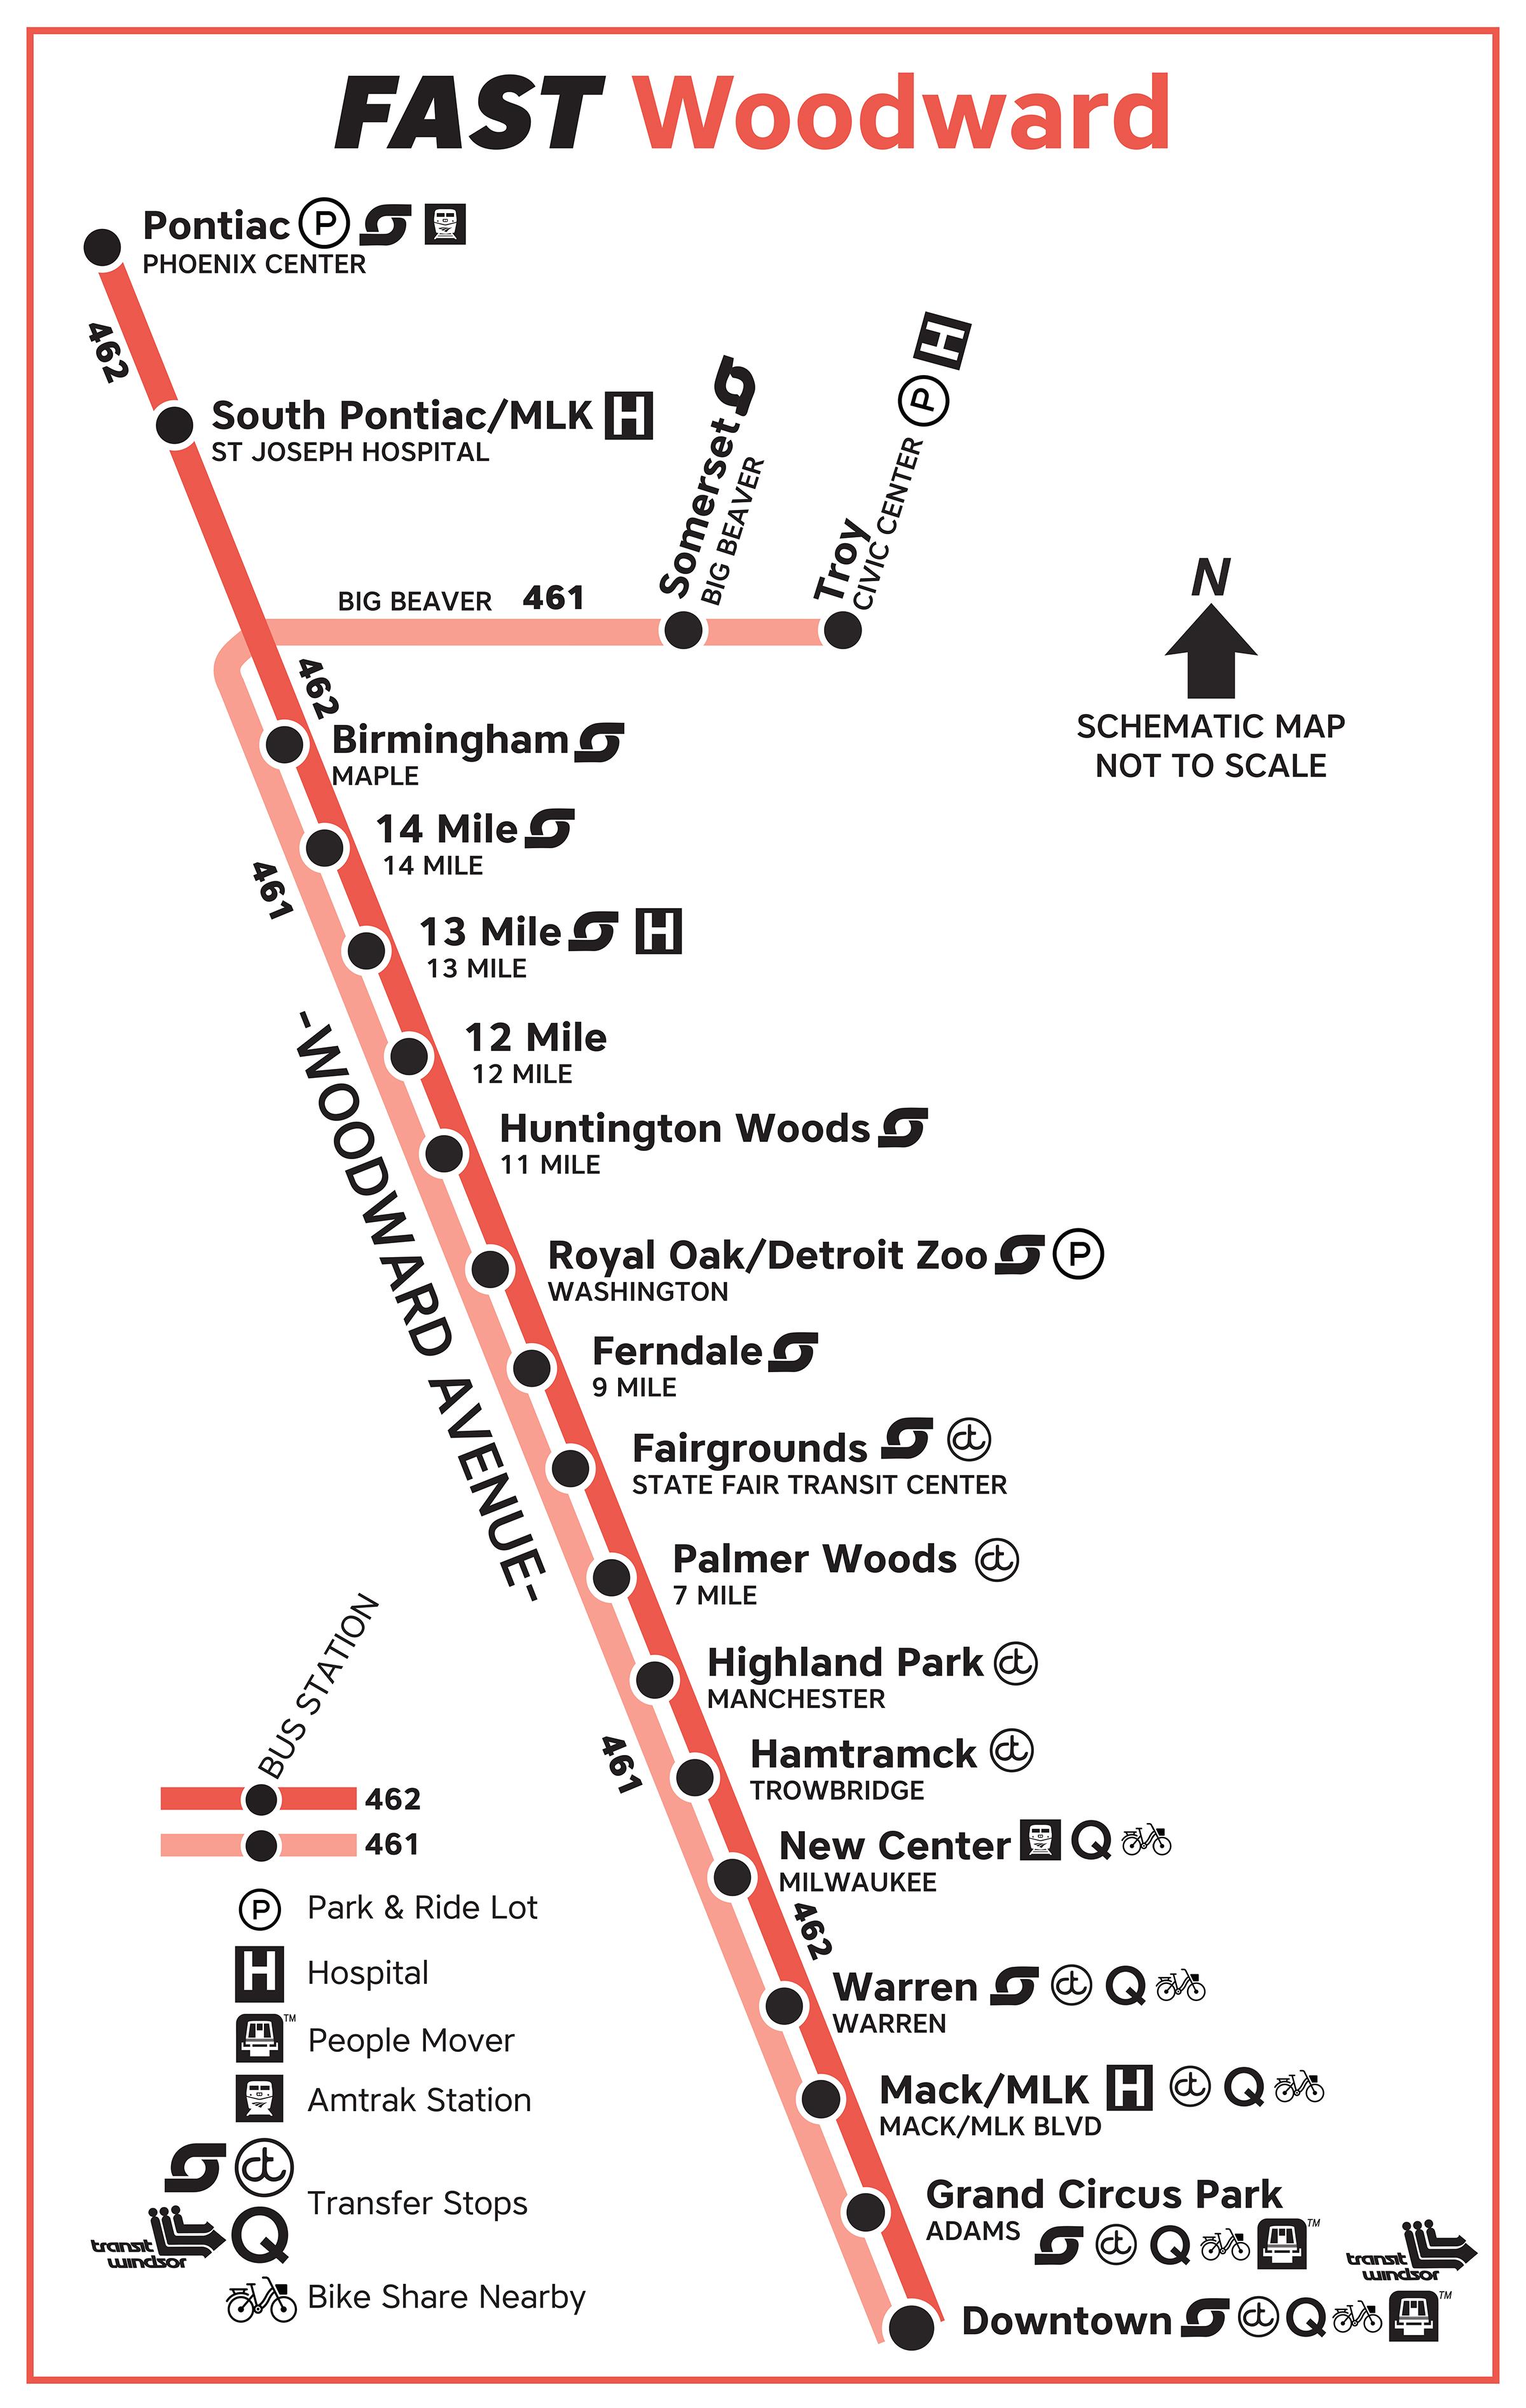 Transit Guide: FAST Bus by SMART - David Gifford - Medium on